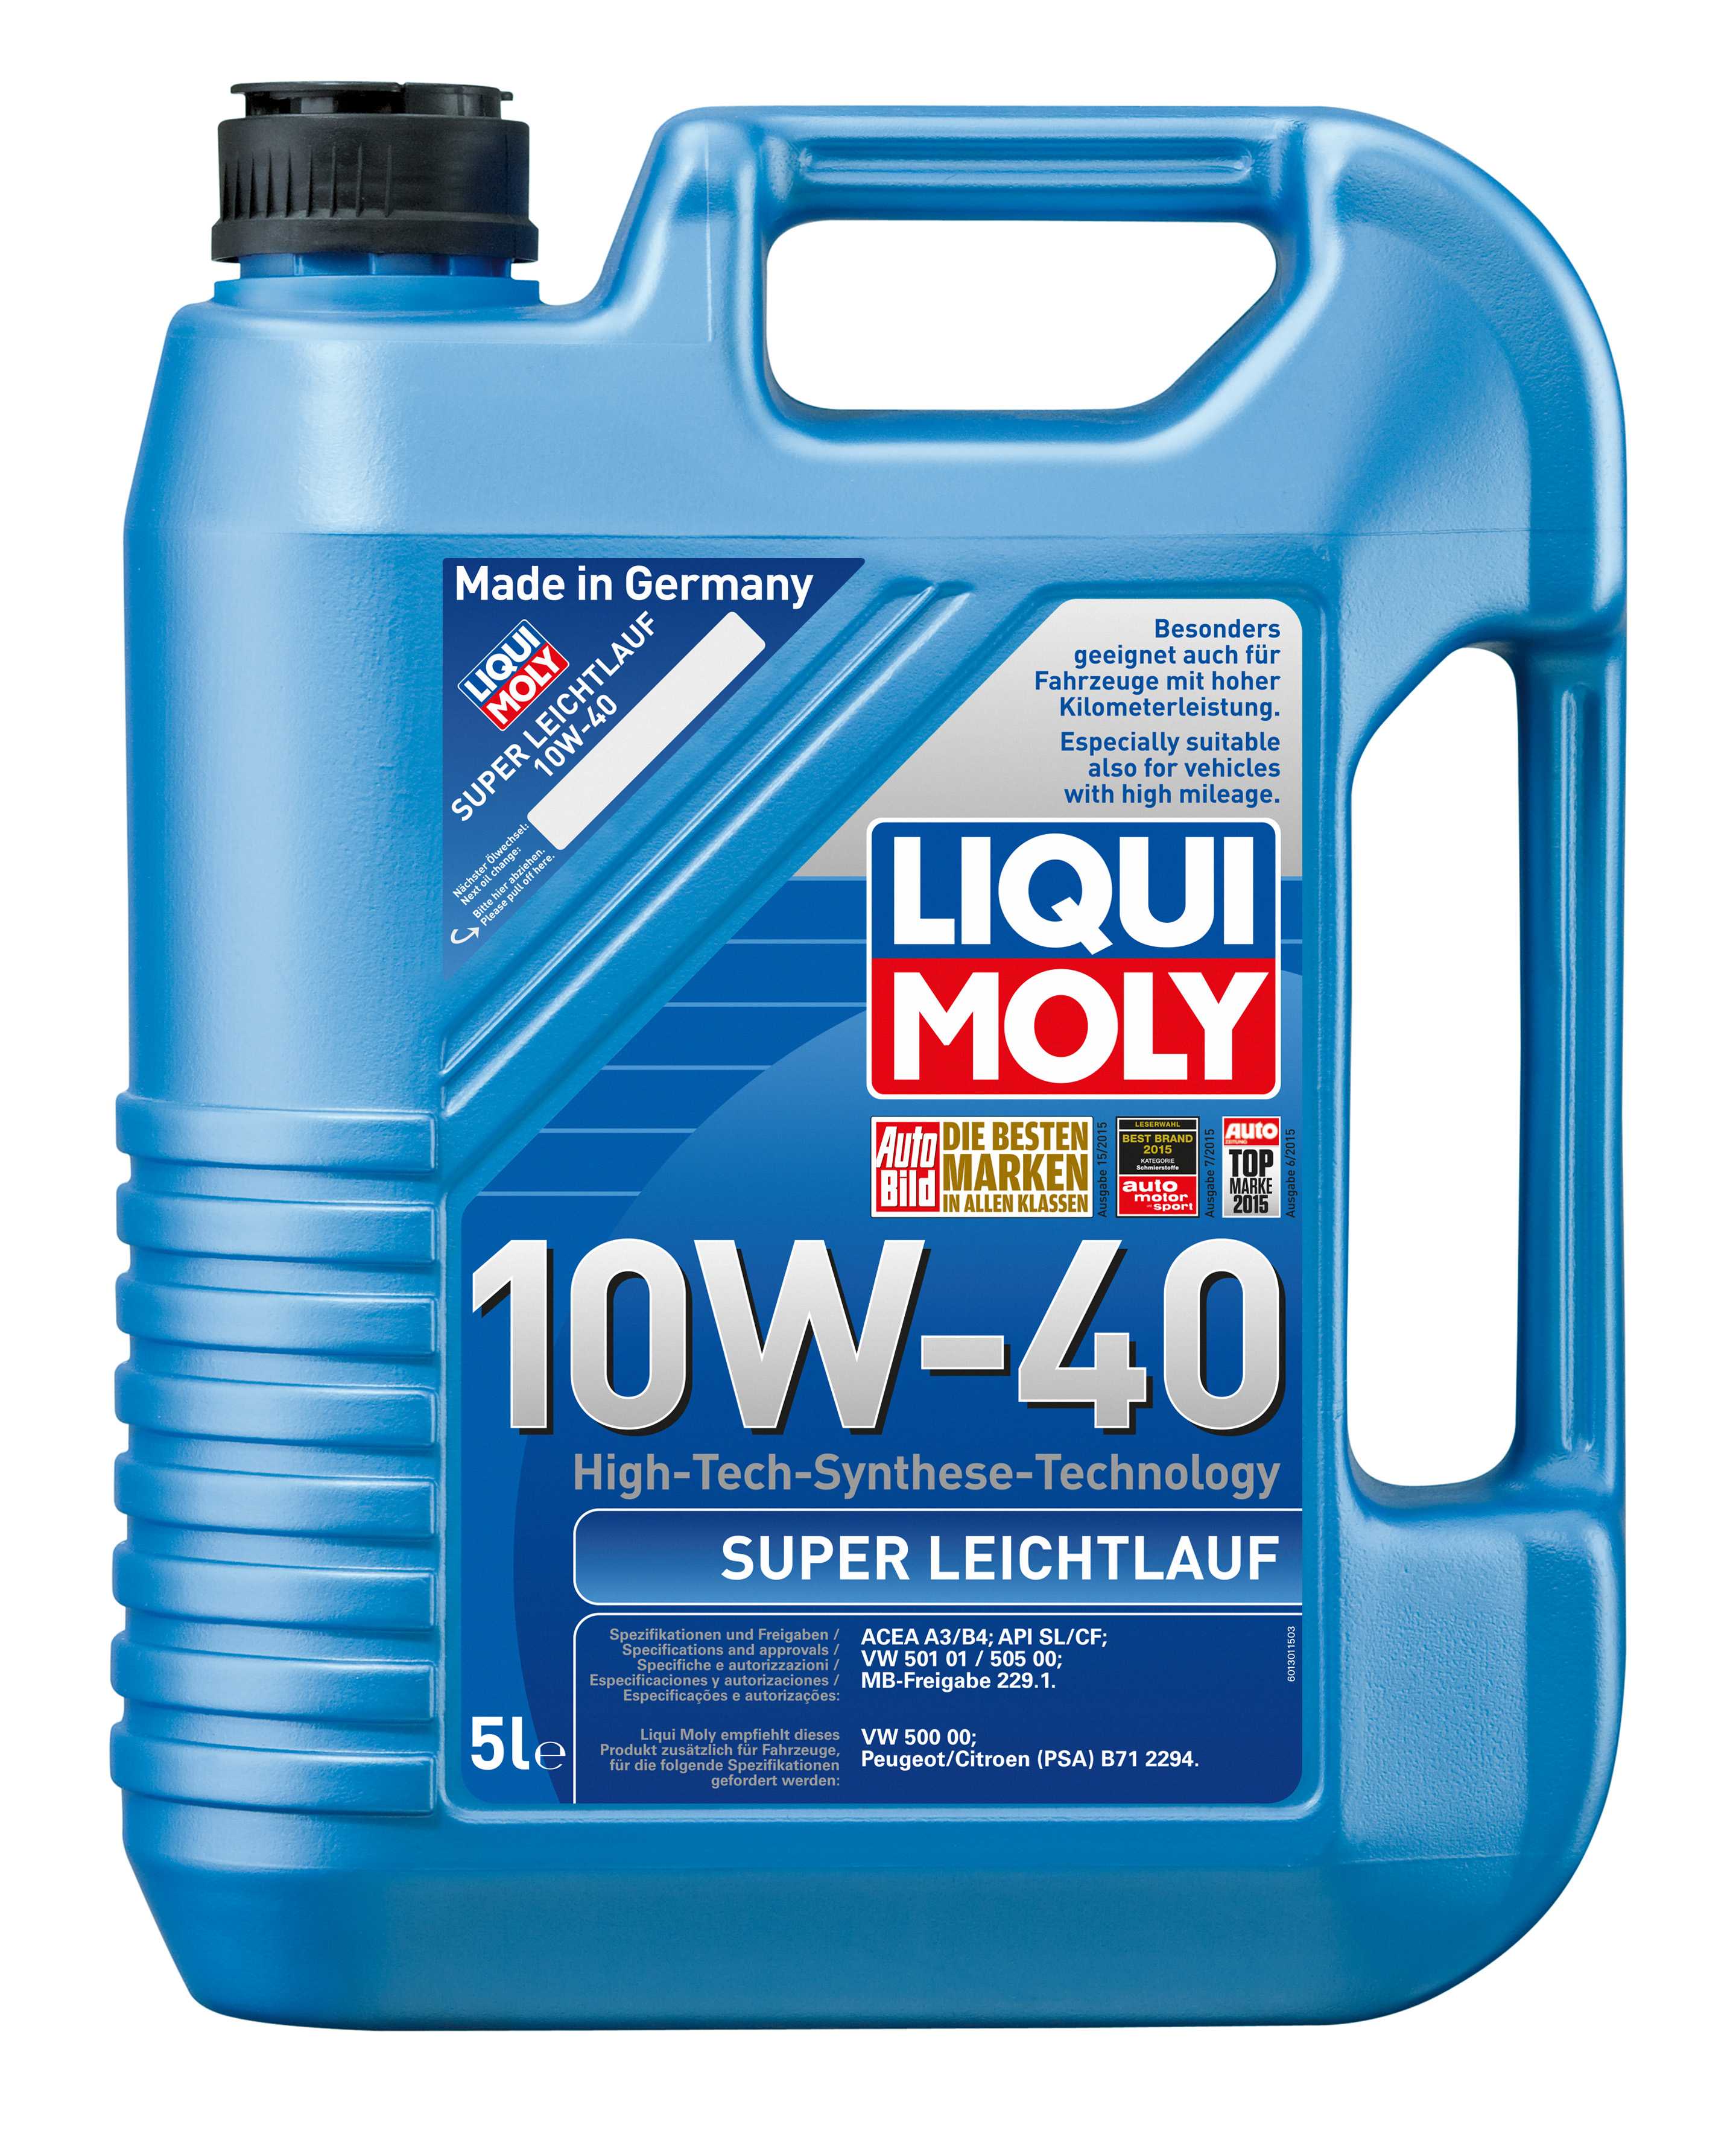 НС-синтетическое моторное масло Super Leichtlauf 10W-40